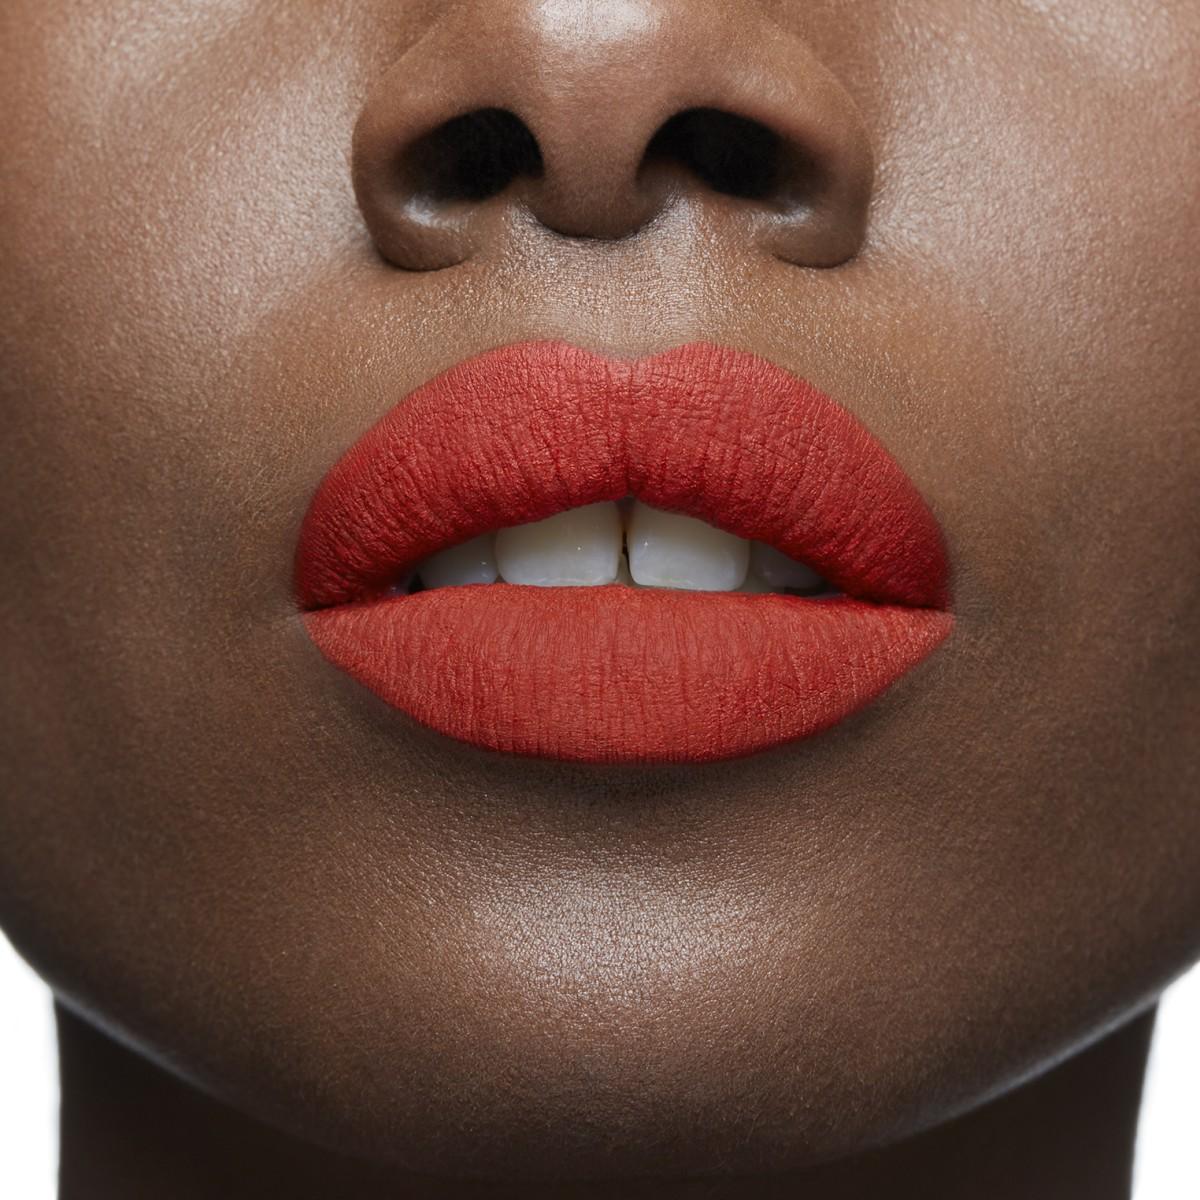 Woman Beauty - リップカラー トリルナ 006m - Christian Louboutin